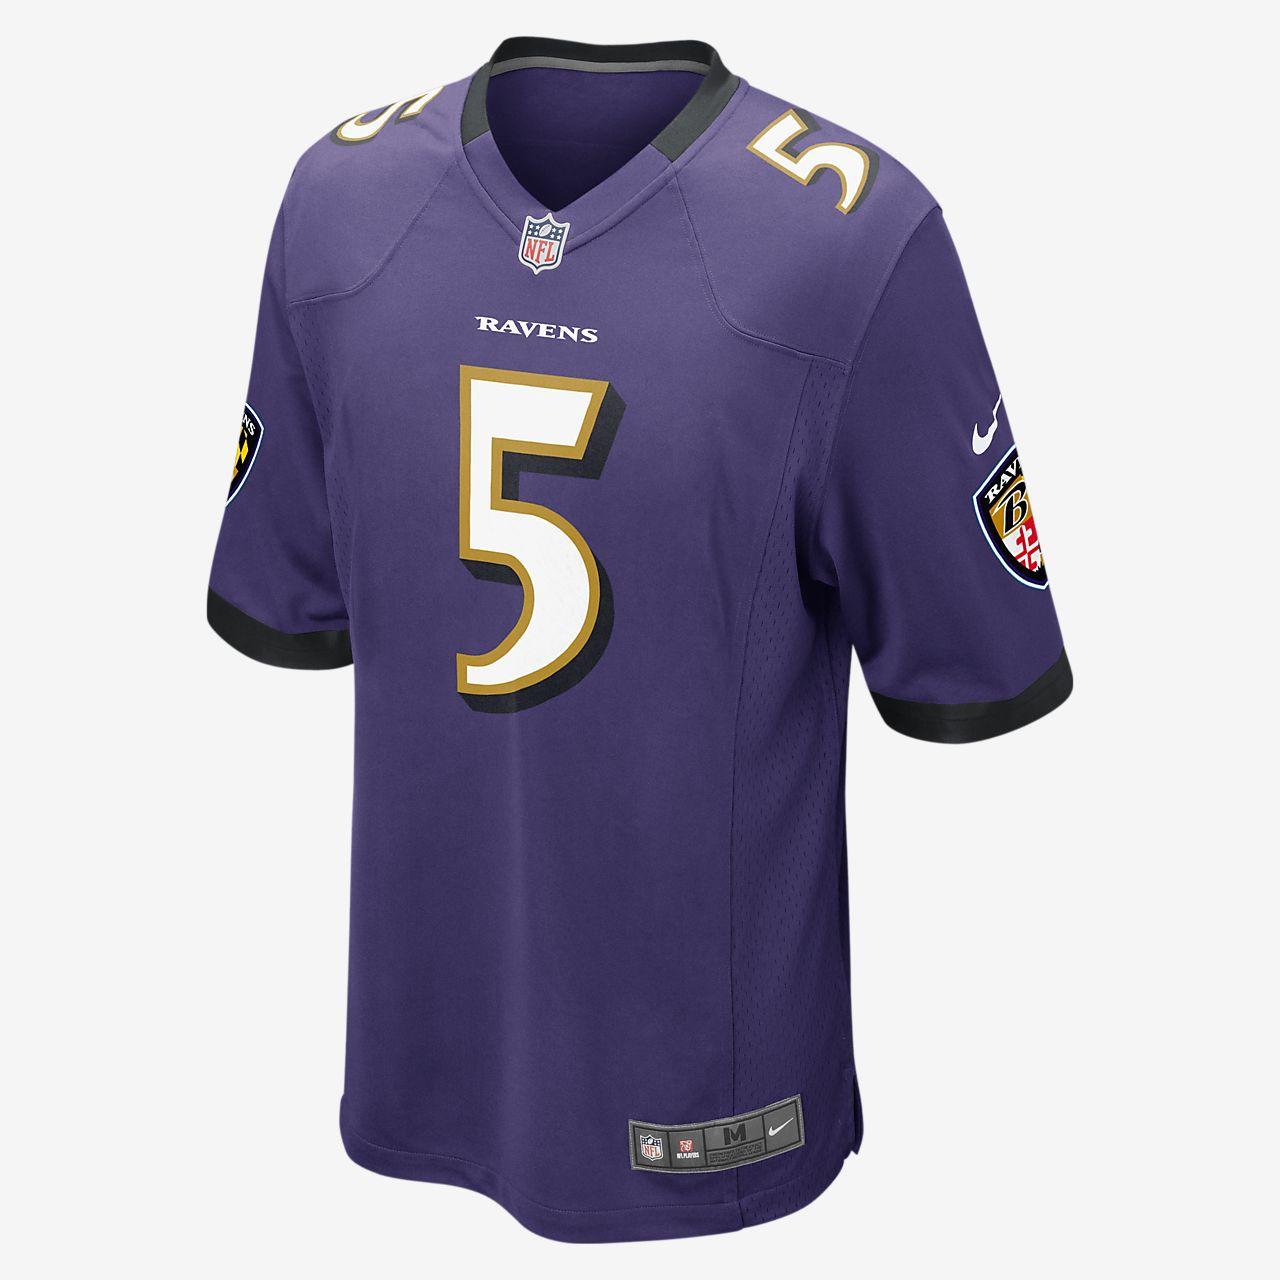 ... NFL Baltimore Ravens (Joe Flacco) Men's Football Home Game Jersey